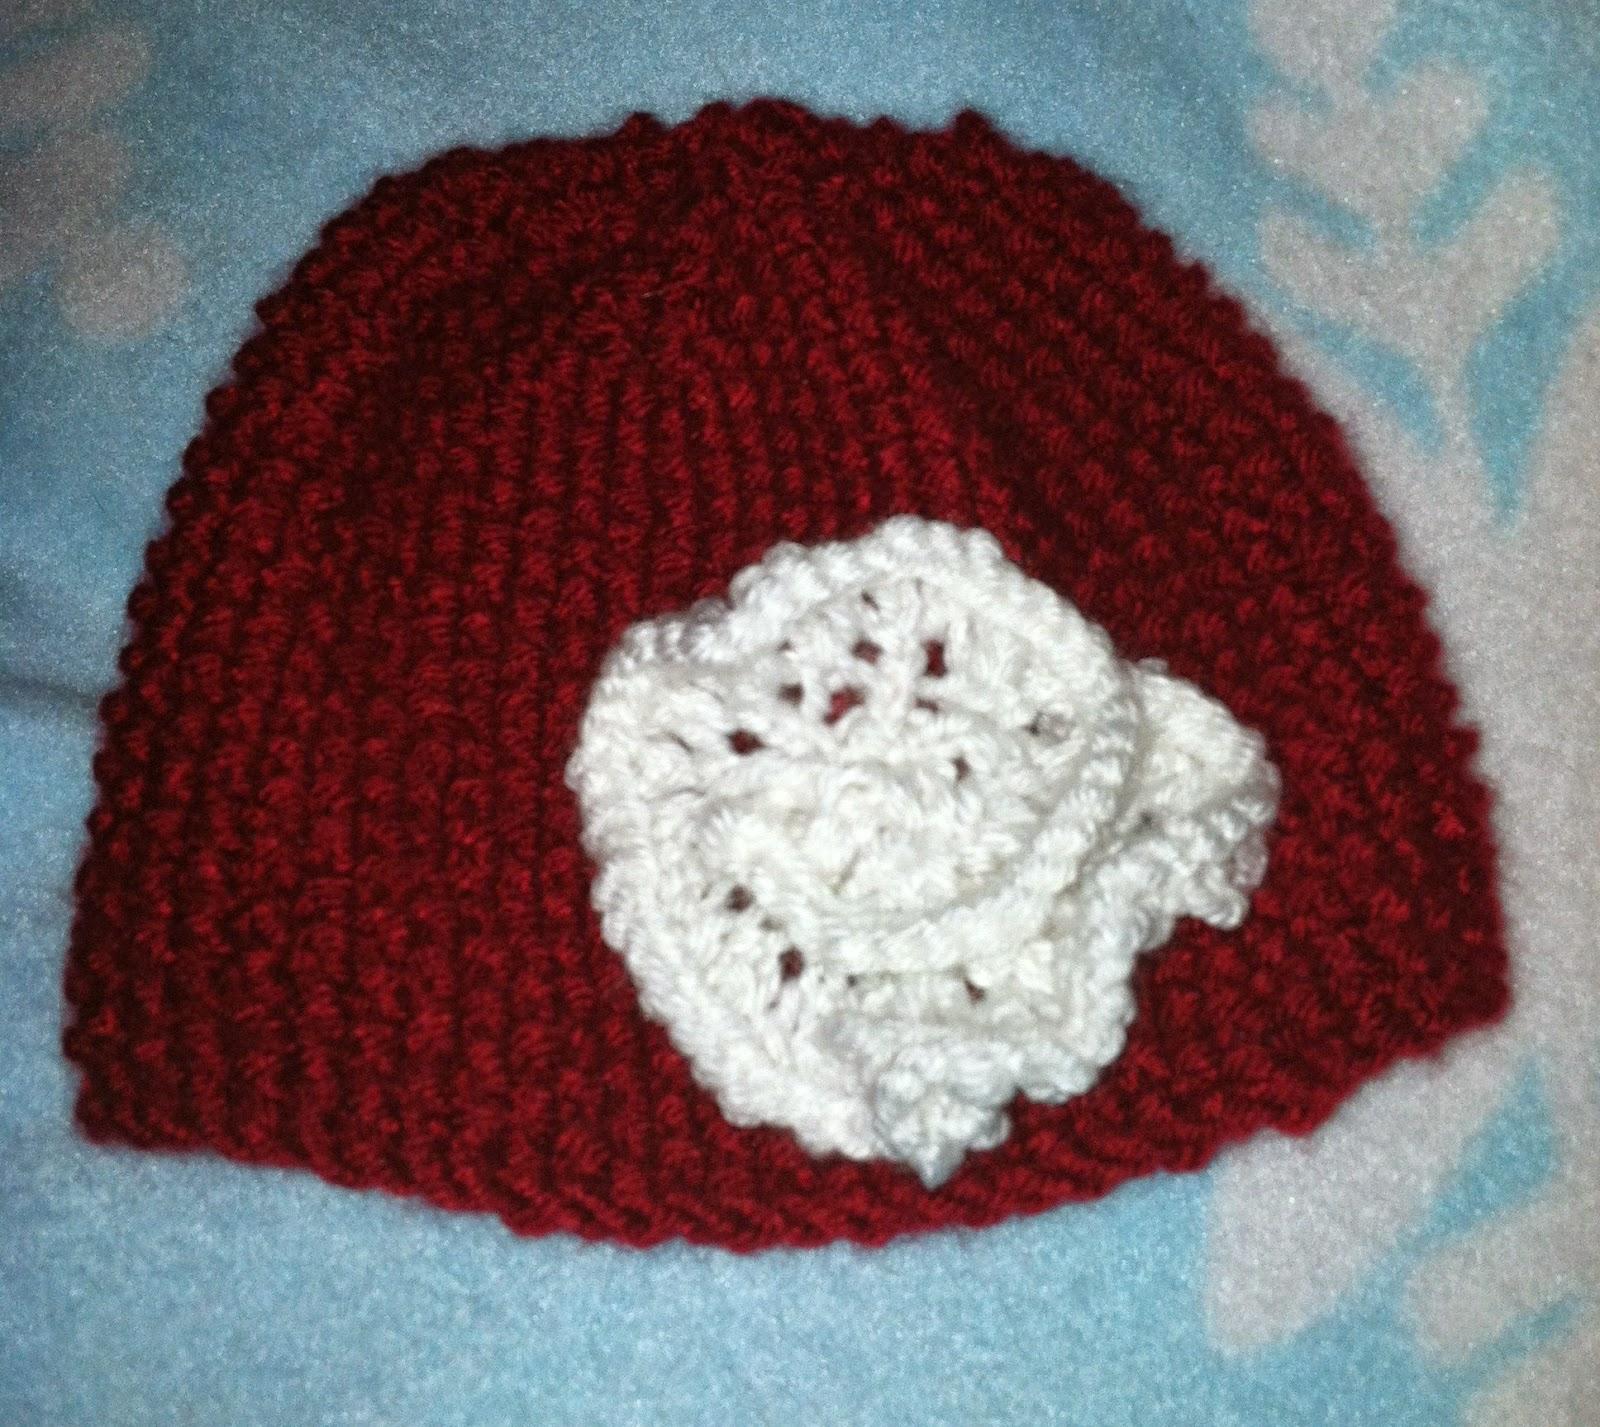 Roses Knitting Centre : Meg joins the navy knitting newborn baby hats diy roses